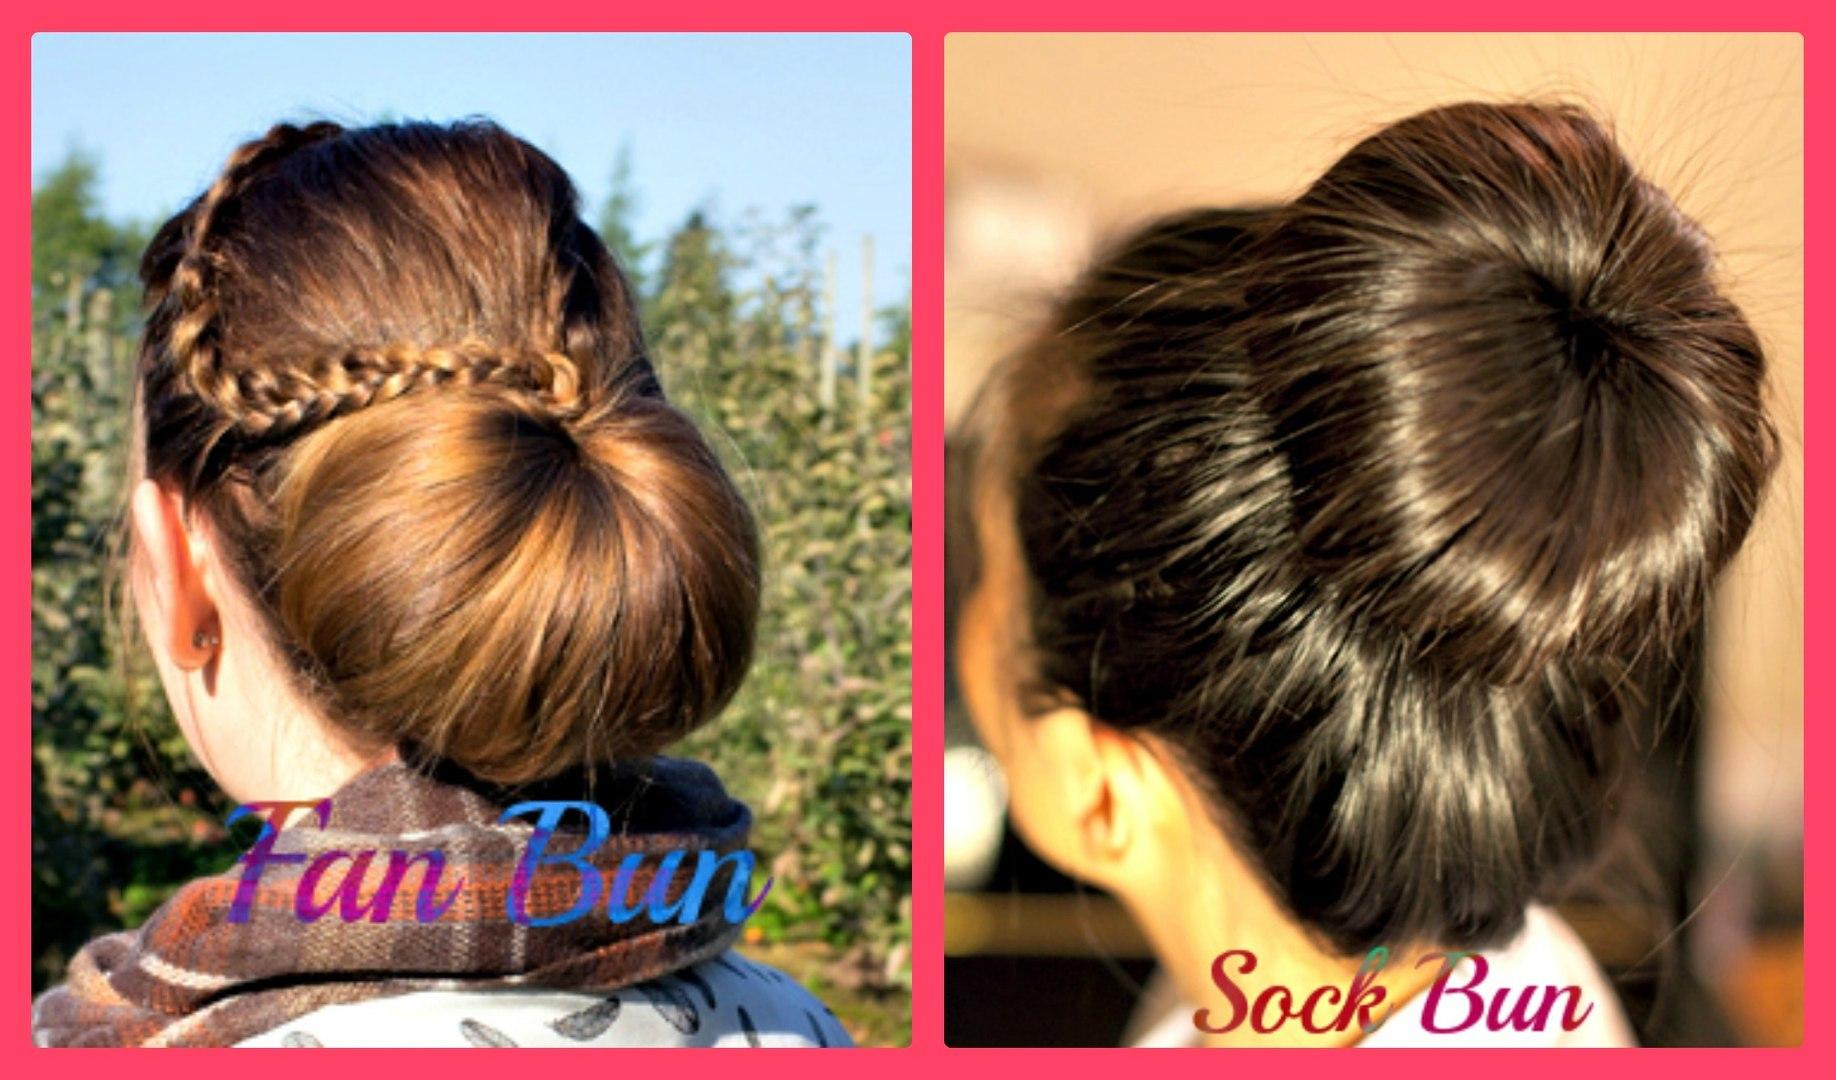 fan and sock bun hair tutorial